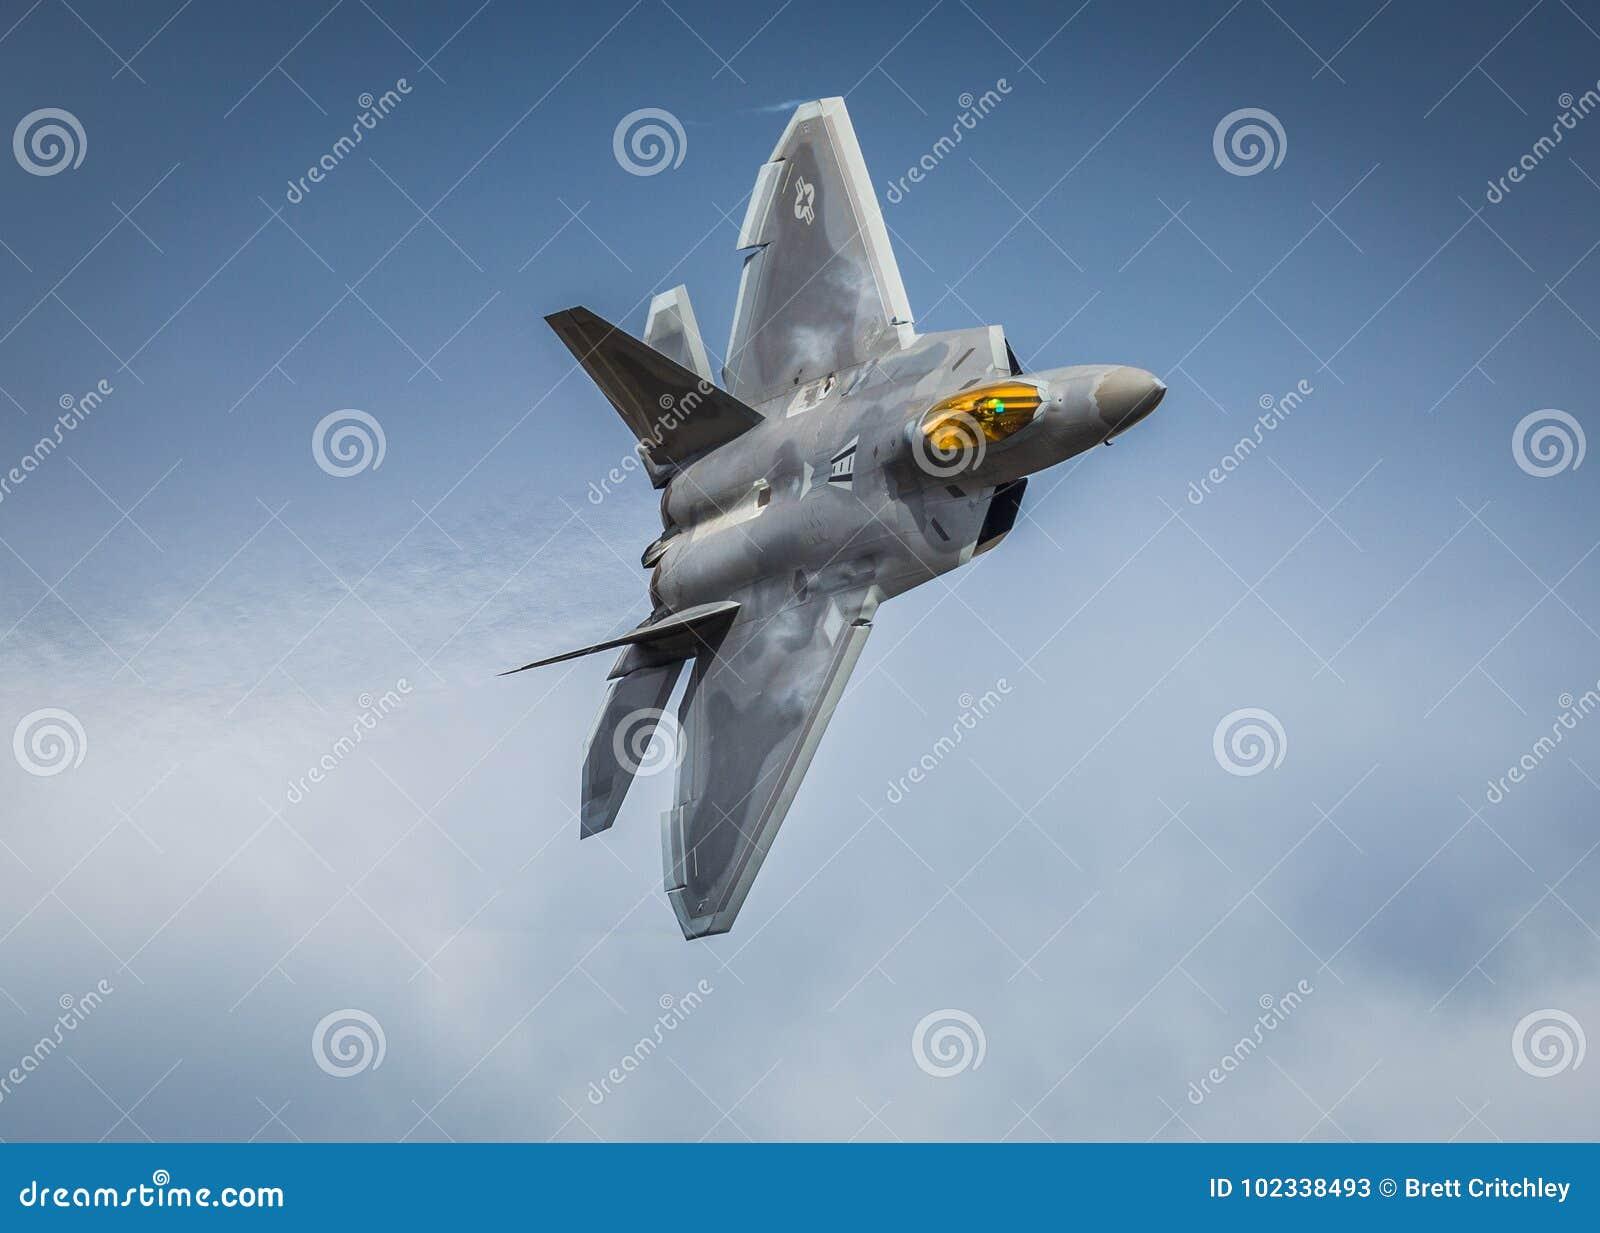 F22 Raptor fighter jet aircraft